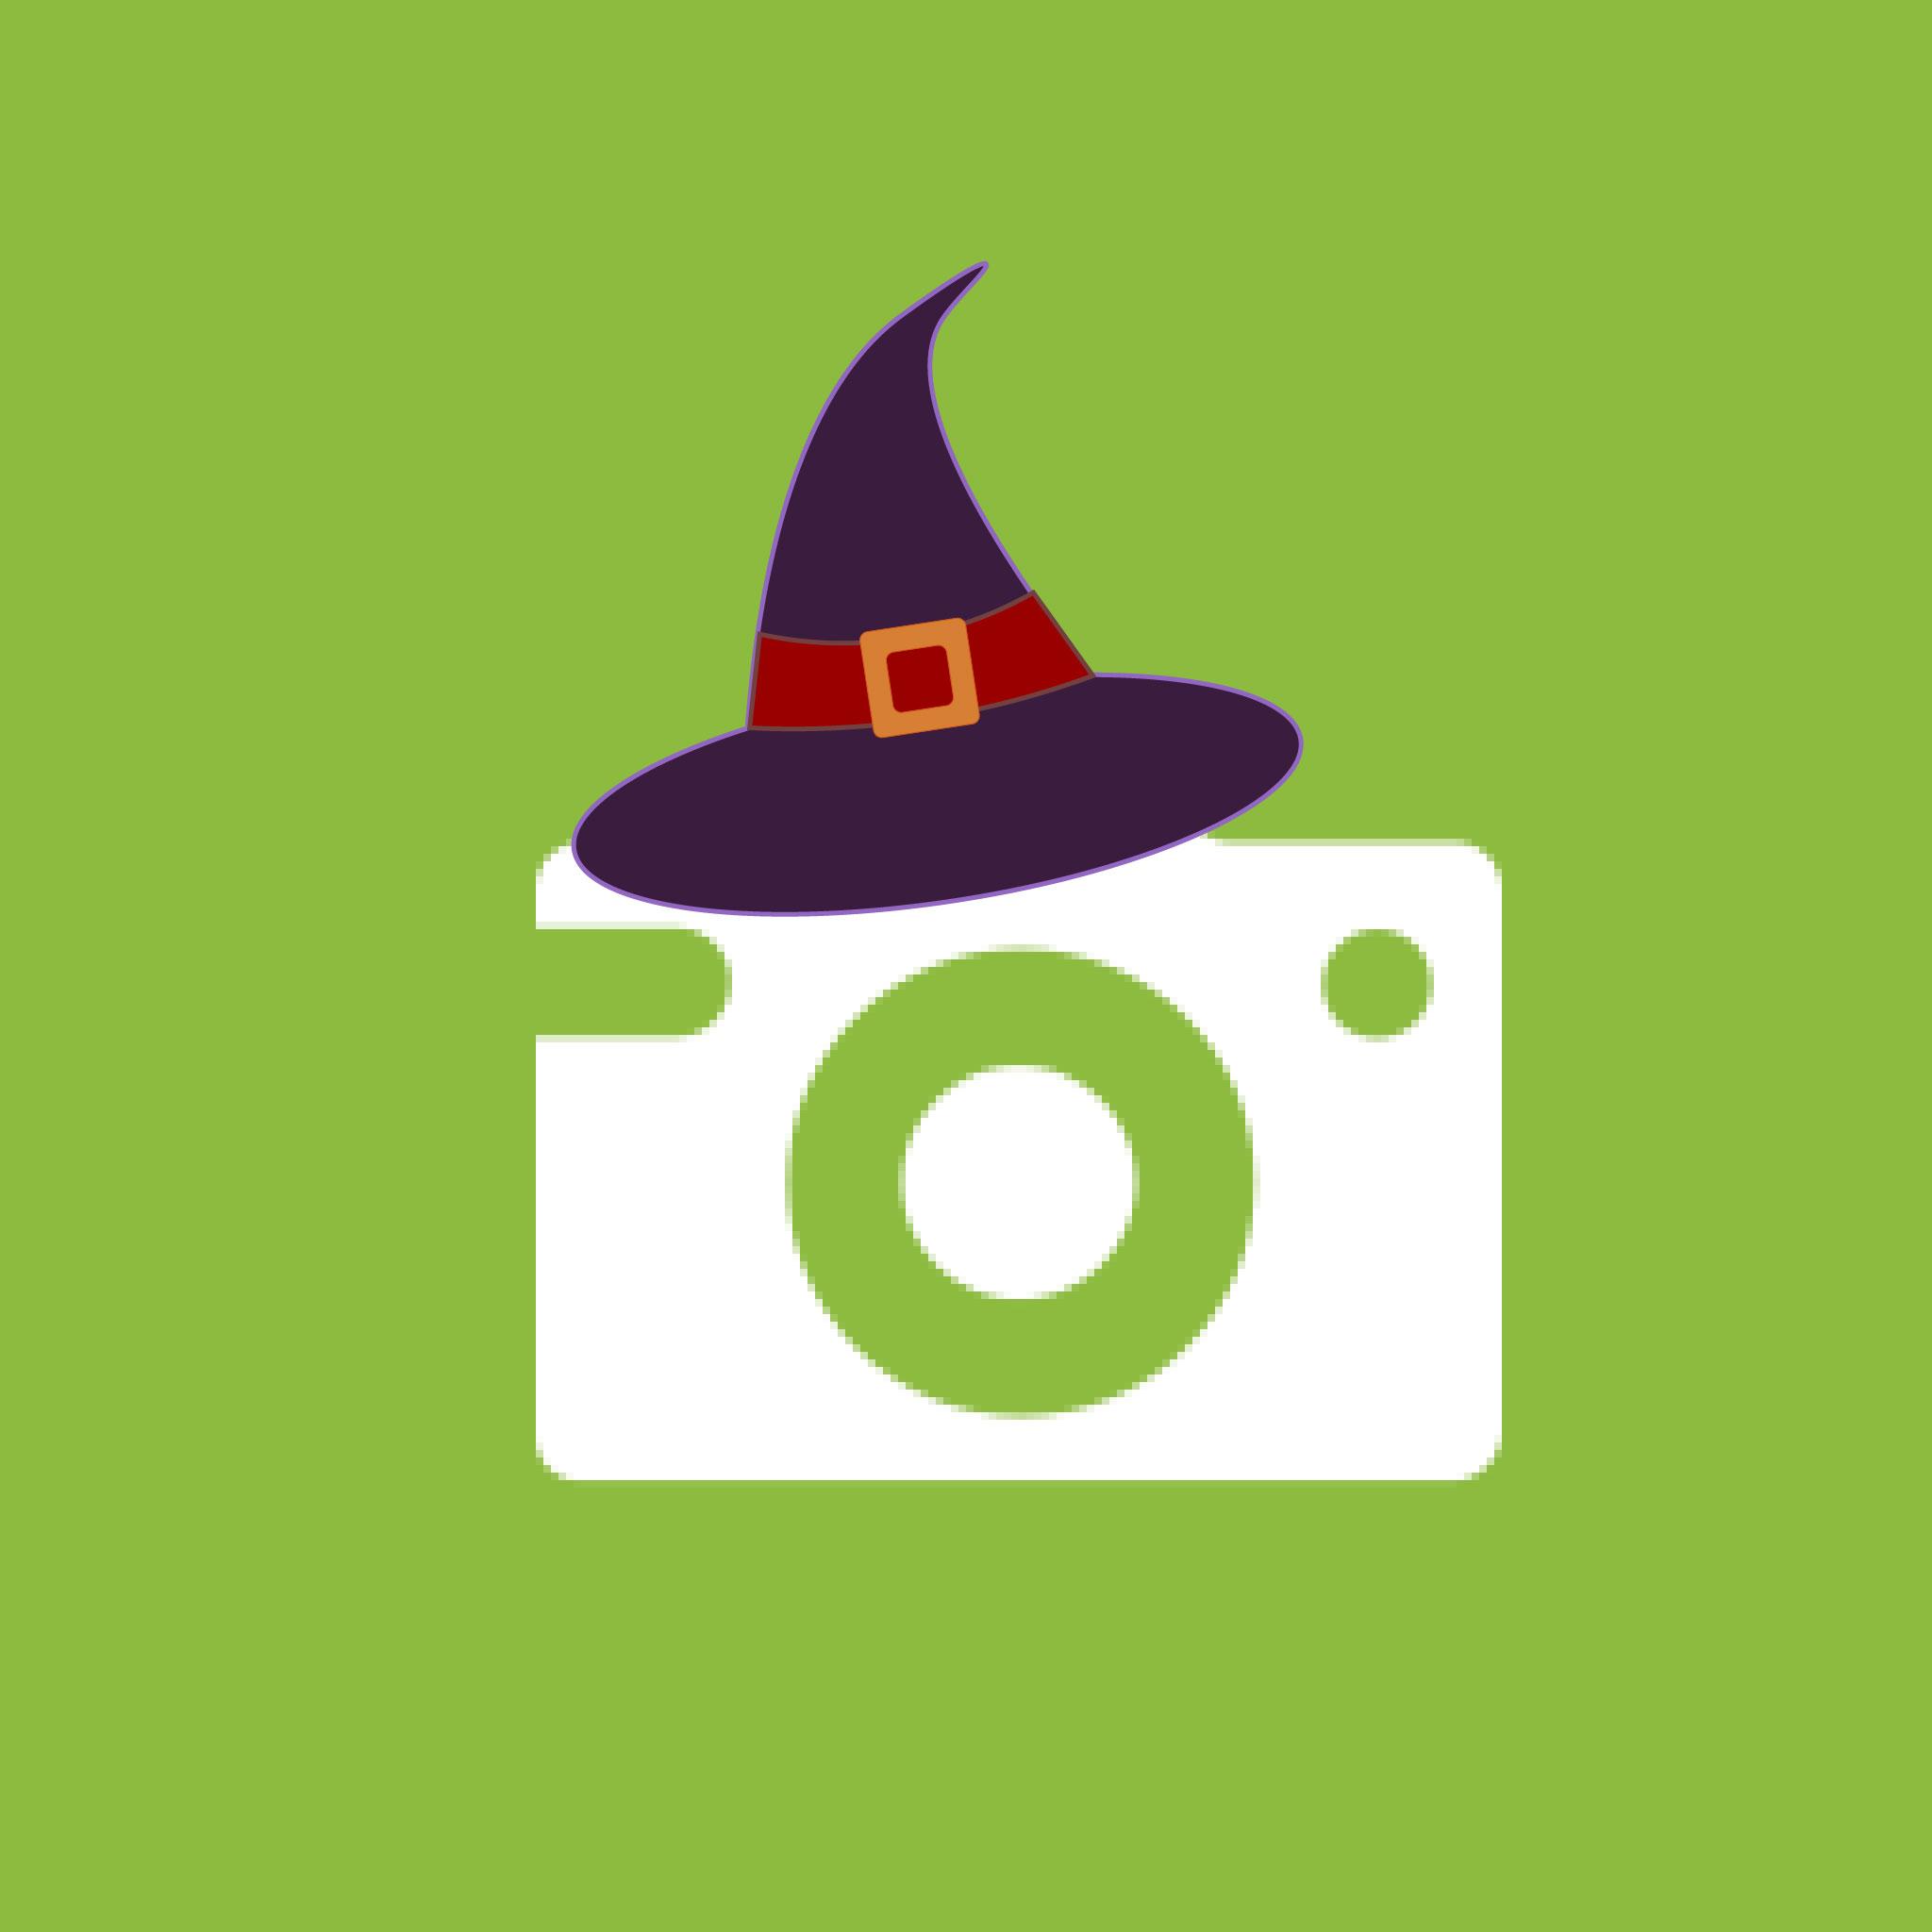 Camera Halloween App Icon from HalloweenCostumes.com